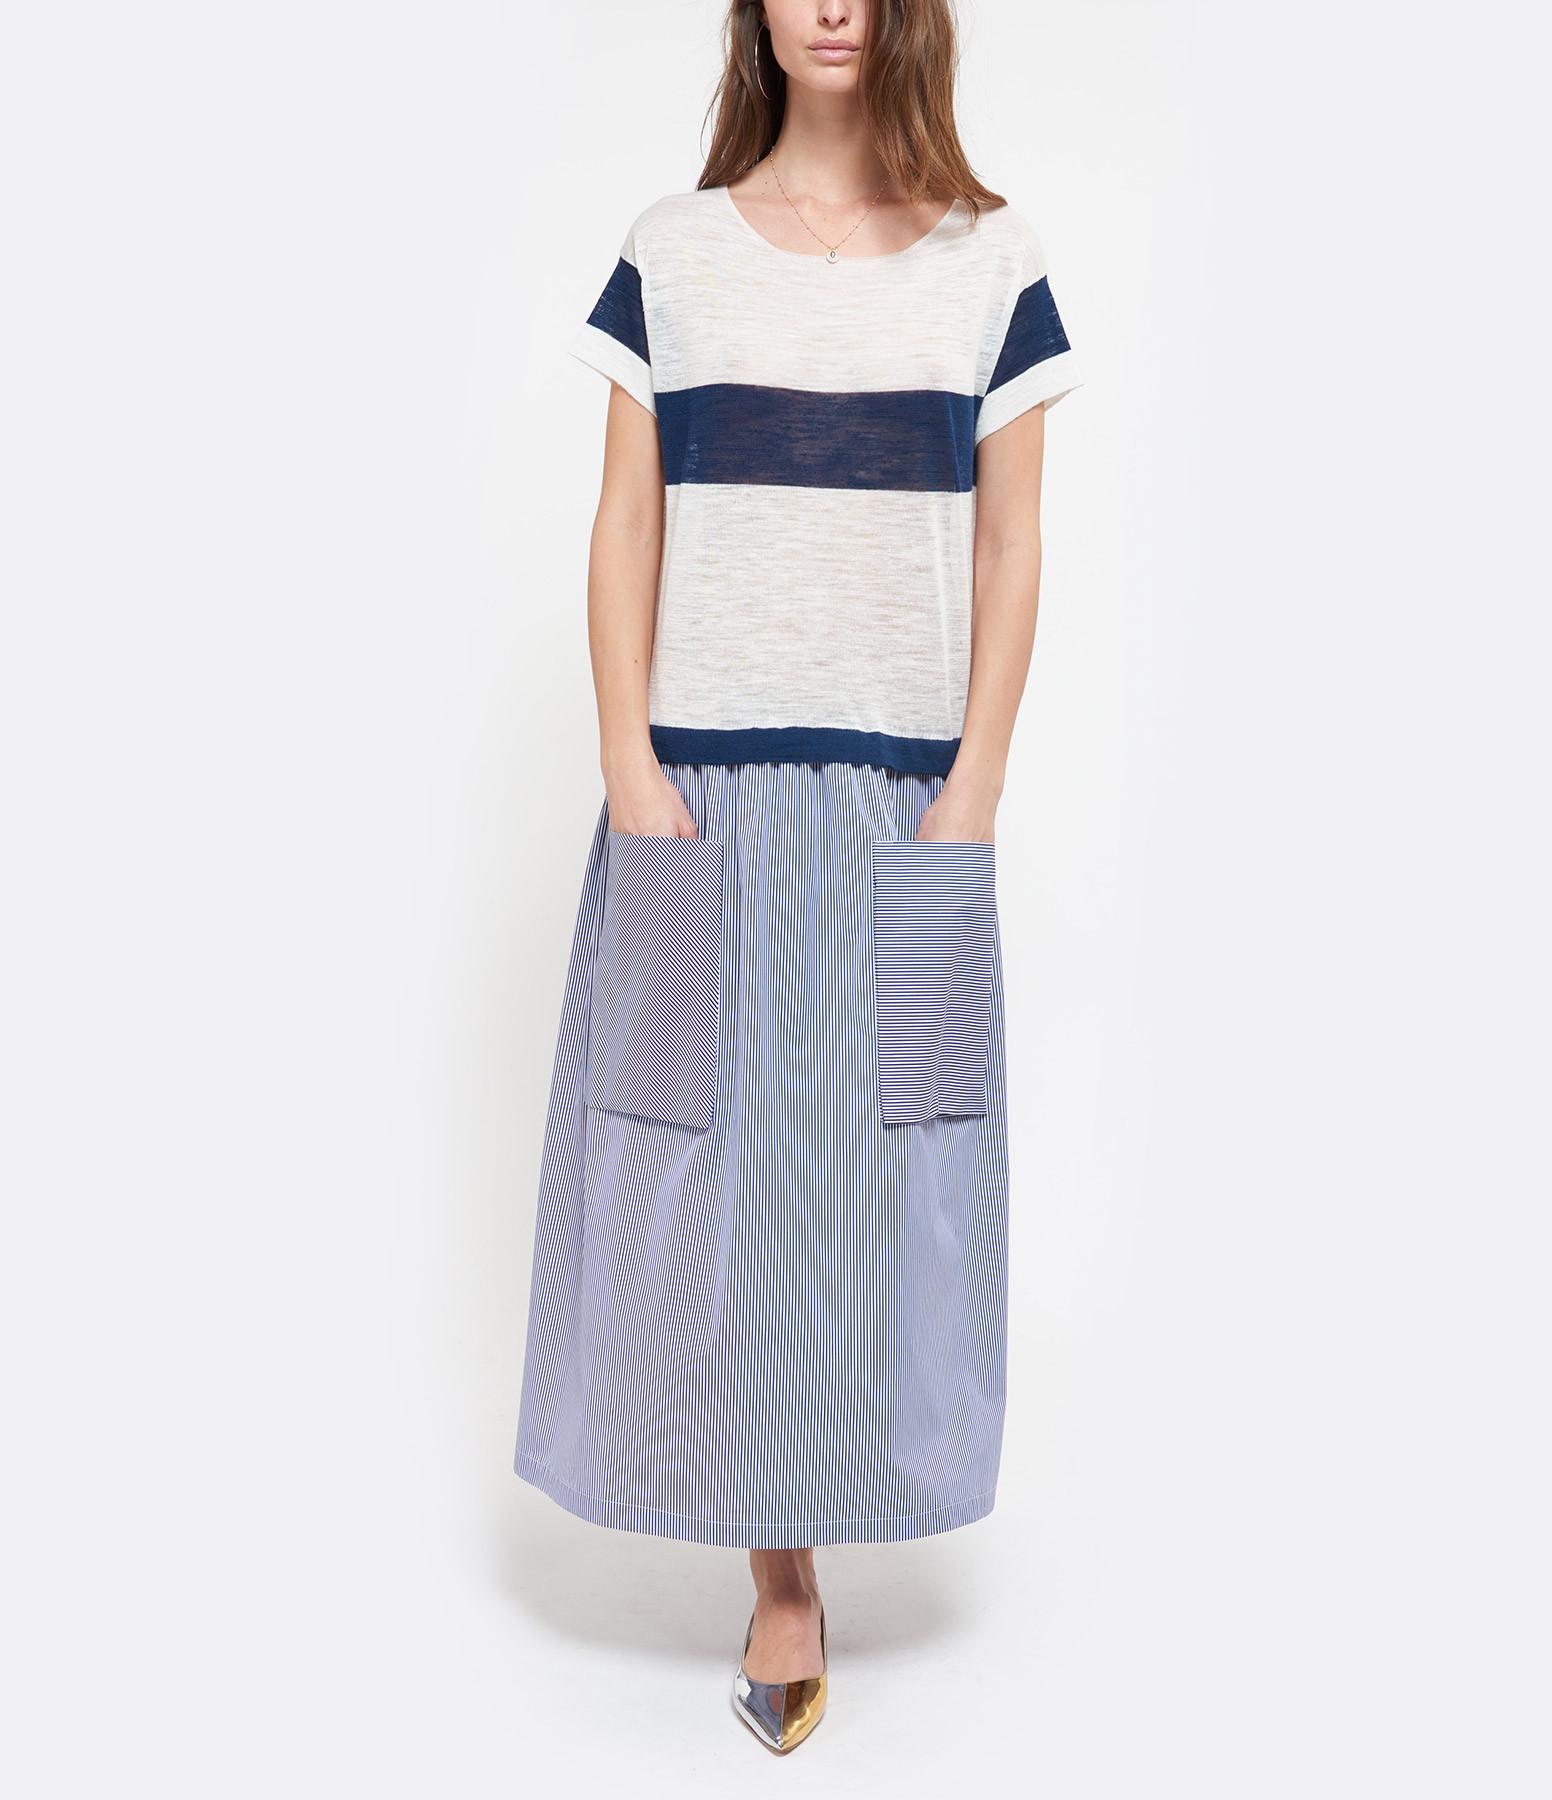 ROBERTO COLLINA - Robe Rayures Imprimé Bleu